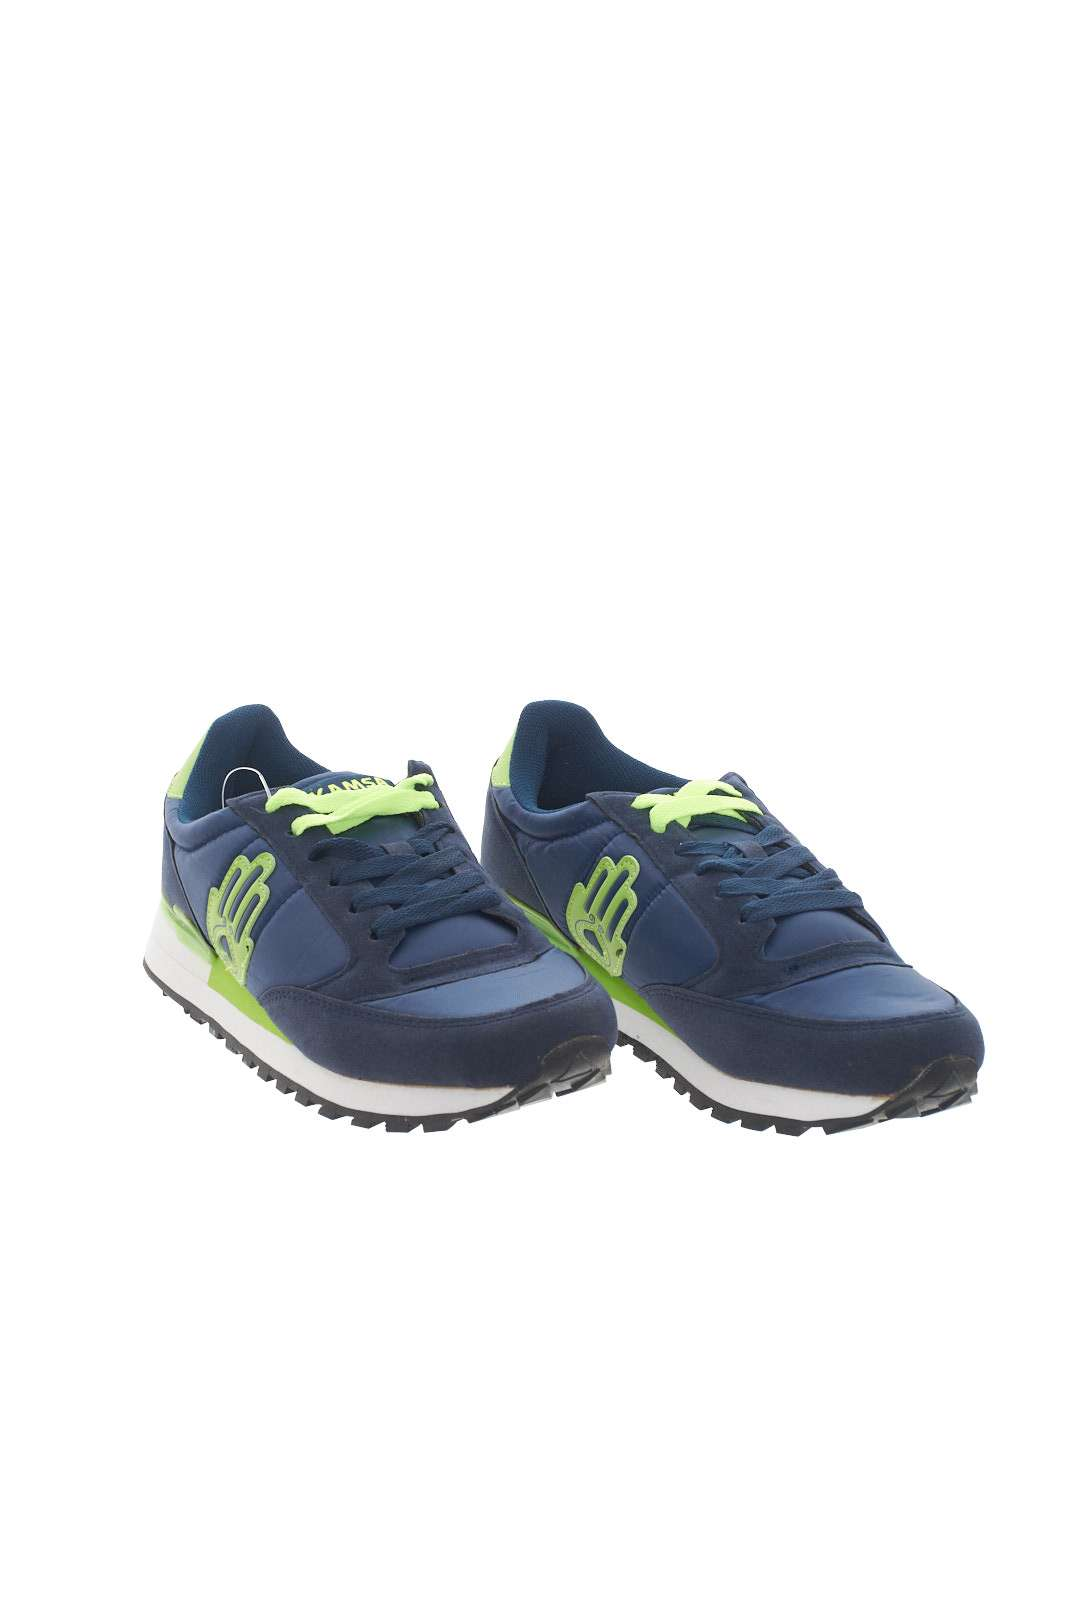 https://www.parmax.com/media/catalog/product/a/i/PE-outlet_parmax-sneaker-donna-Kamsa-KAMSA2020-D.jpg